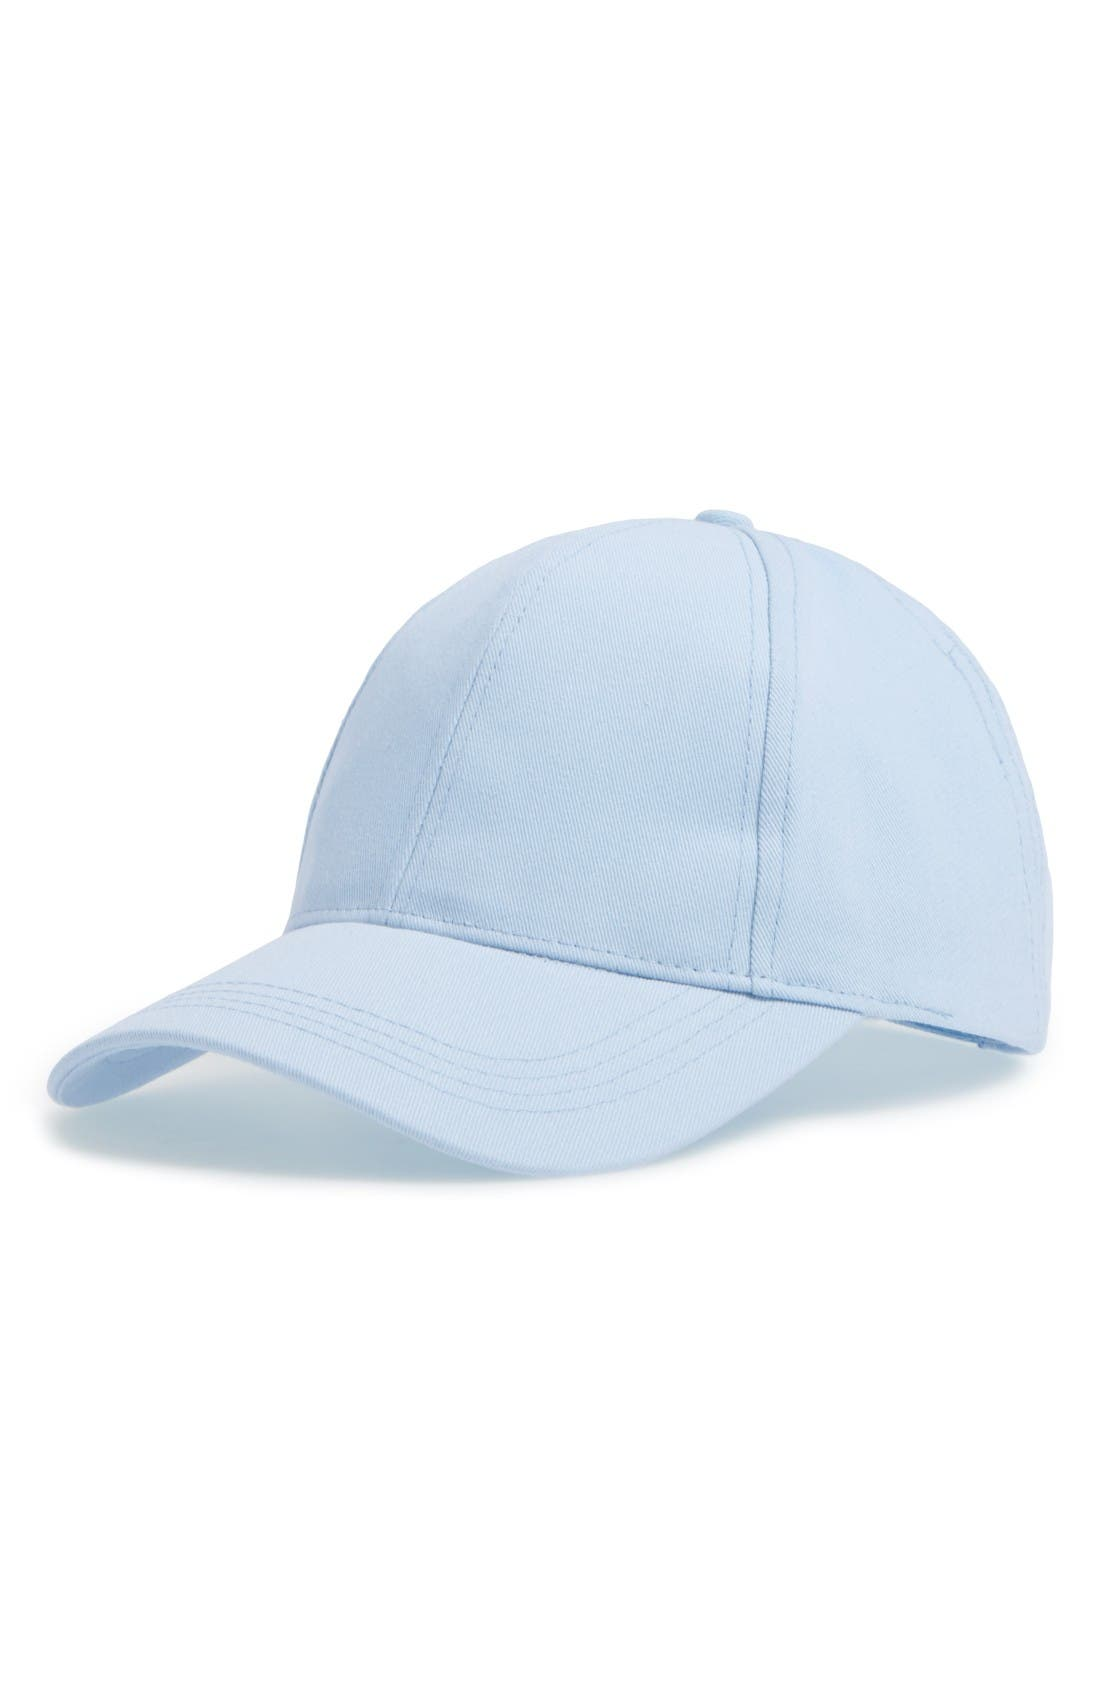 Alternate Image 1 Selected - BP. Cotton Ball Cap